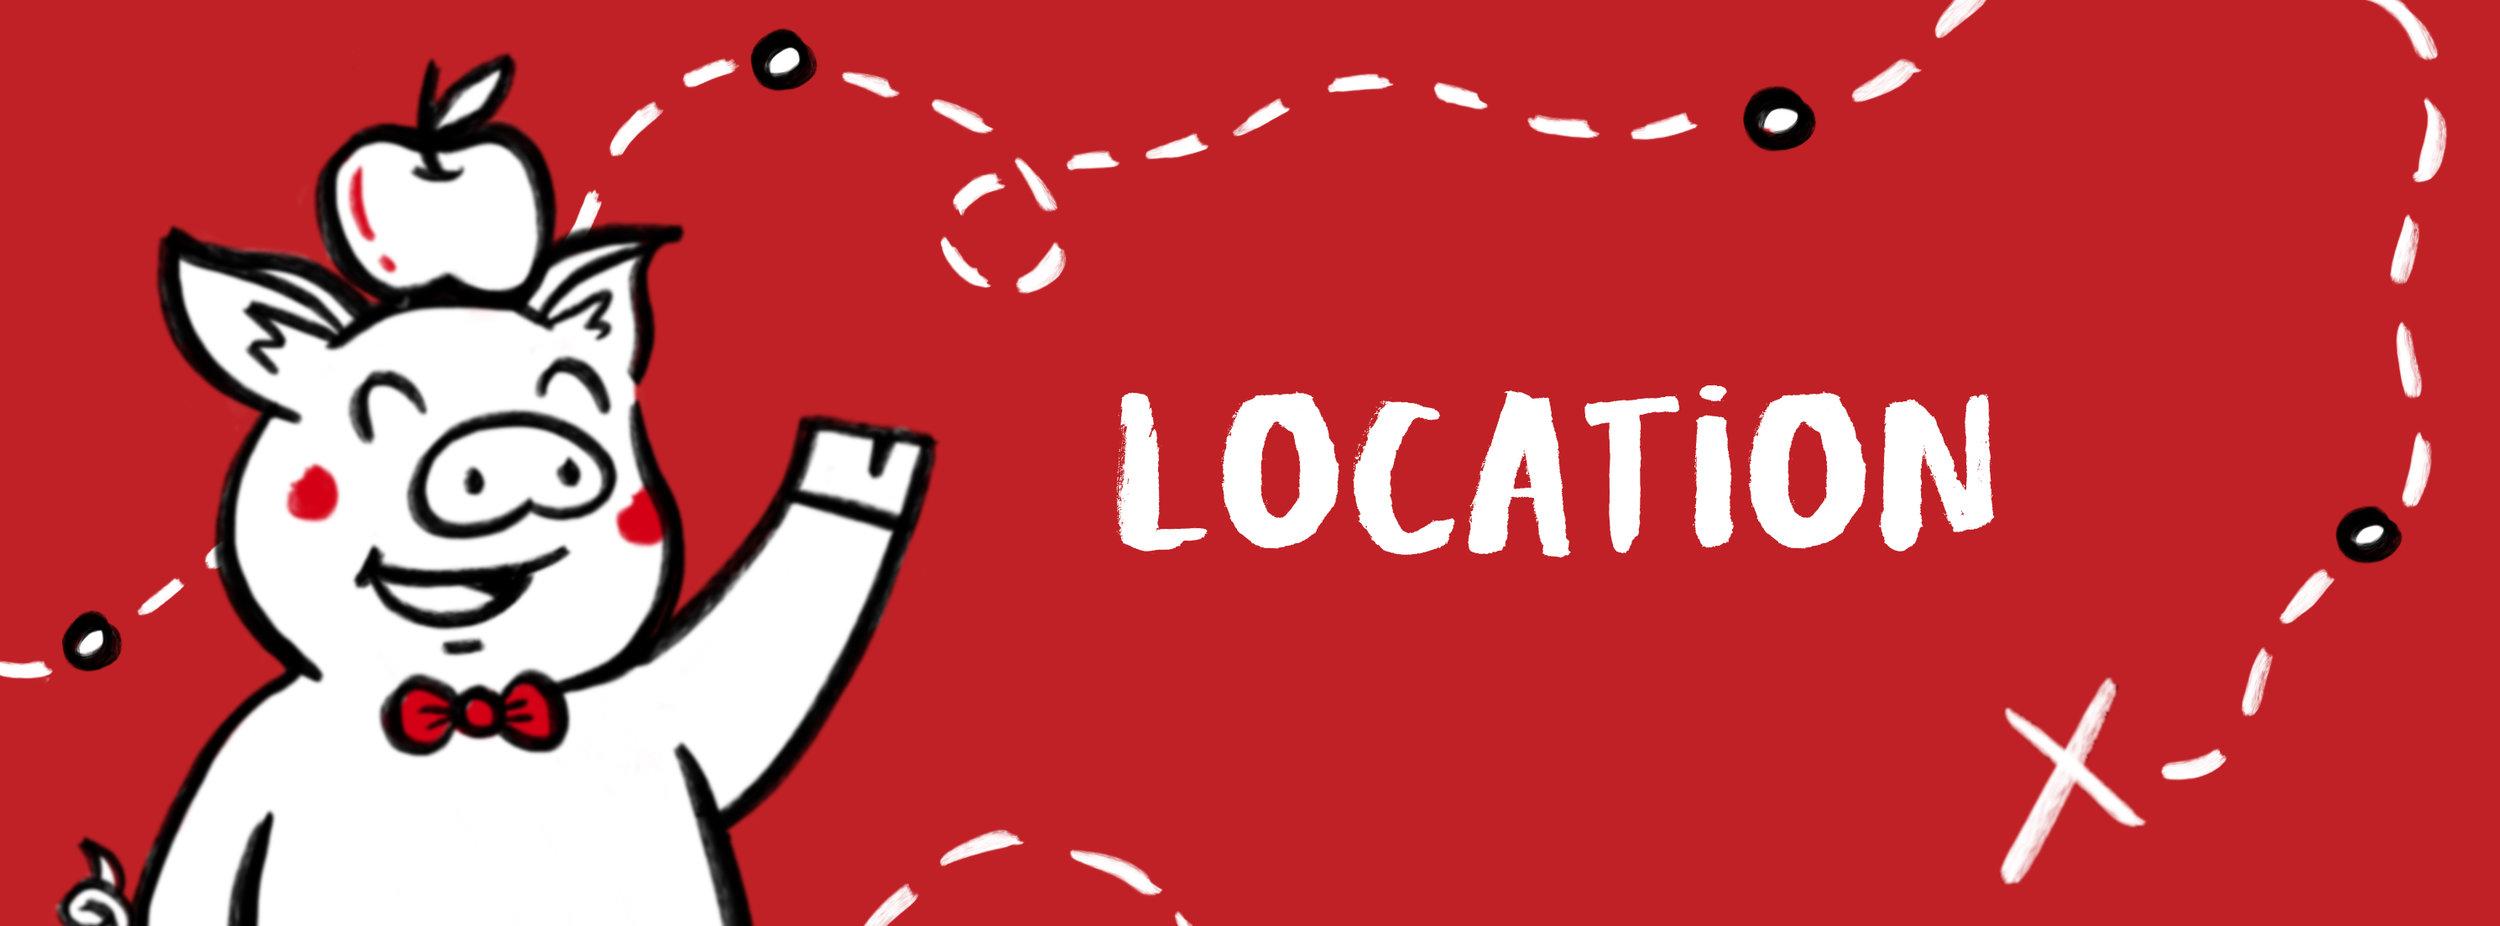 Location_Heading.jpg